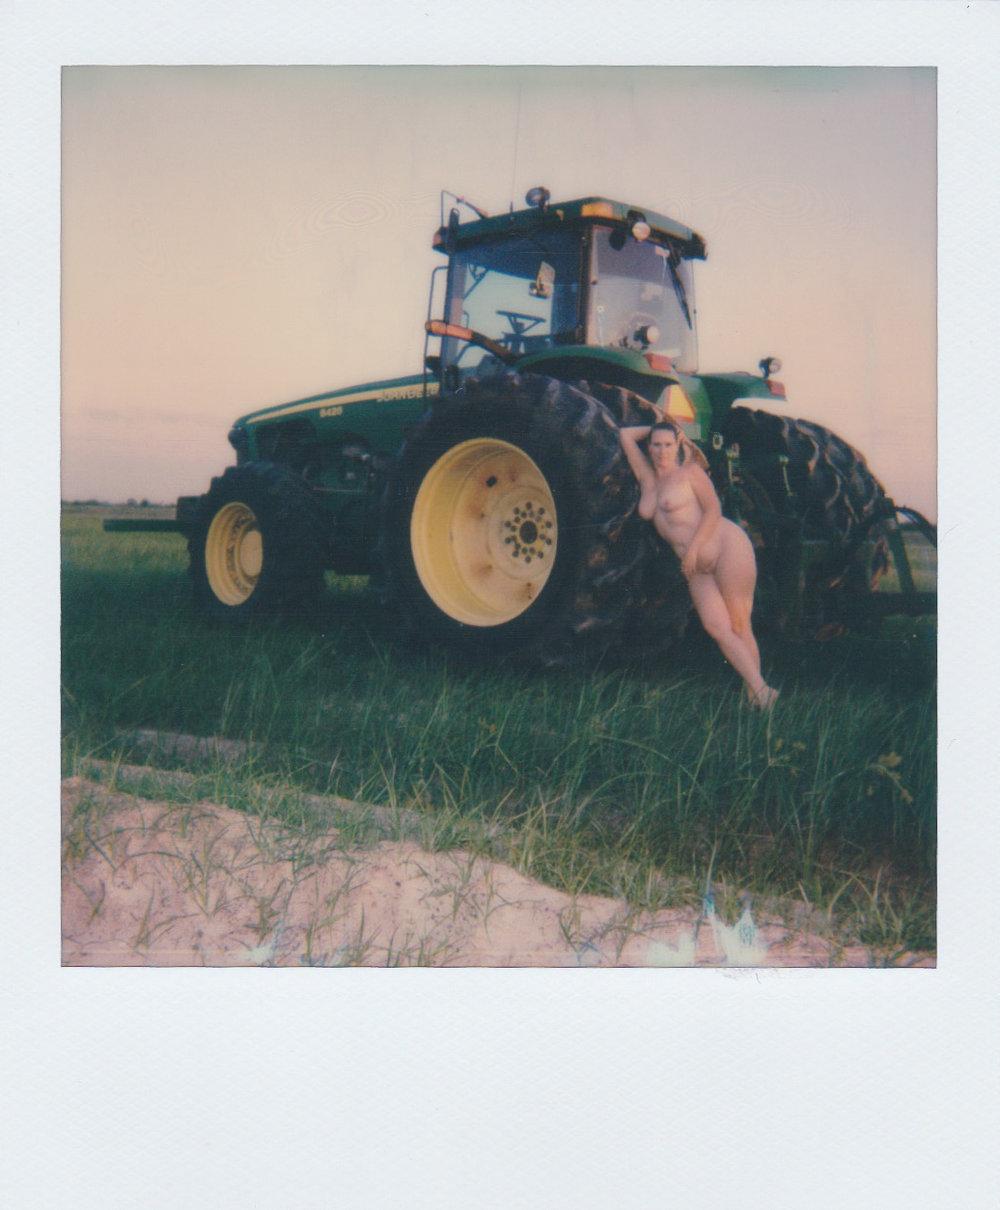 Polaroid project Day 2-5 by JW Purdy